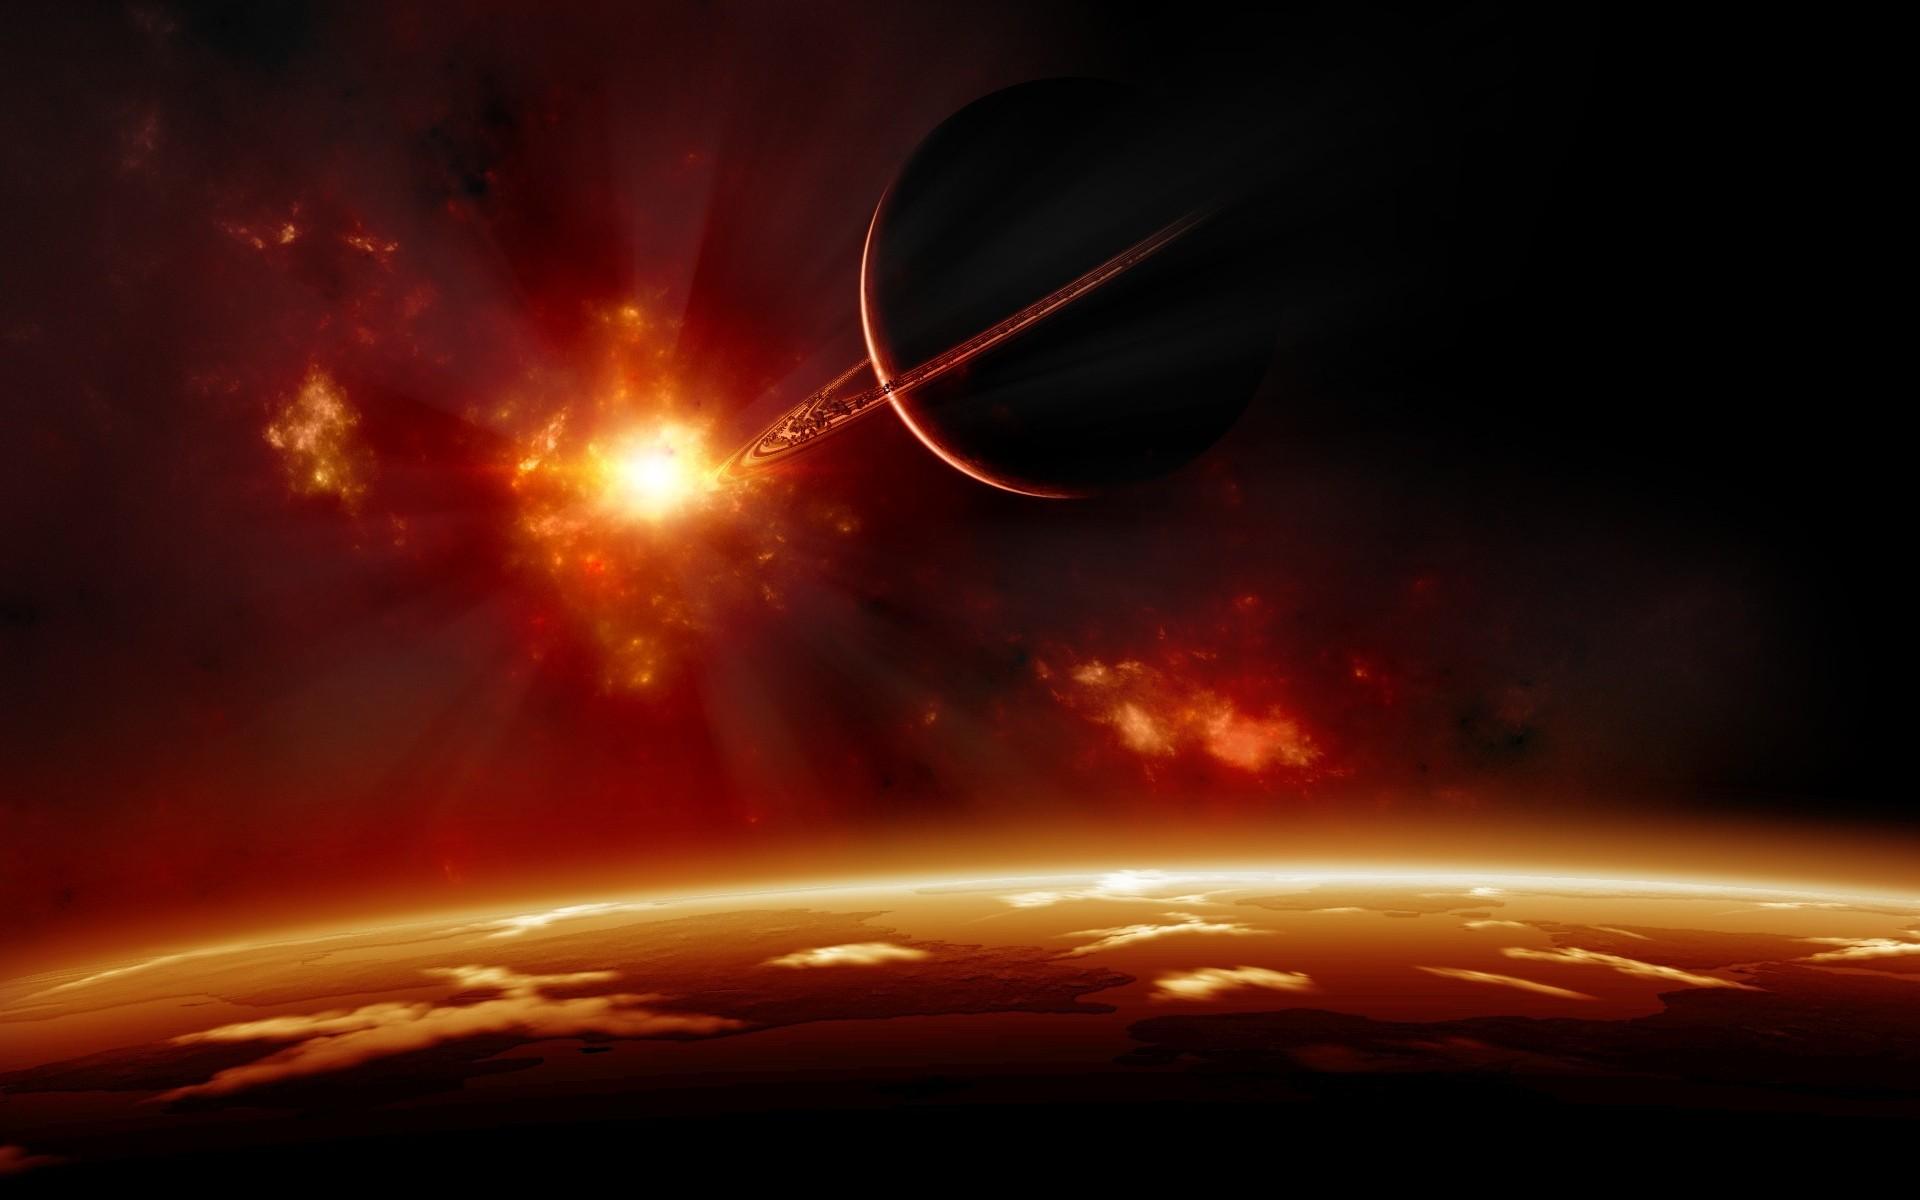 планеты, звезда, туманность